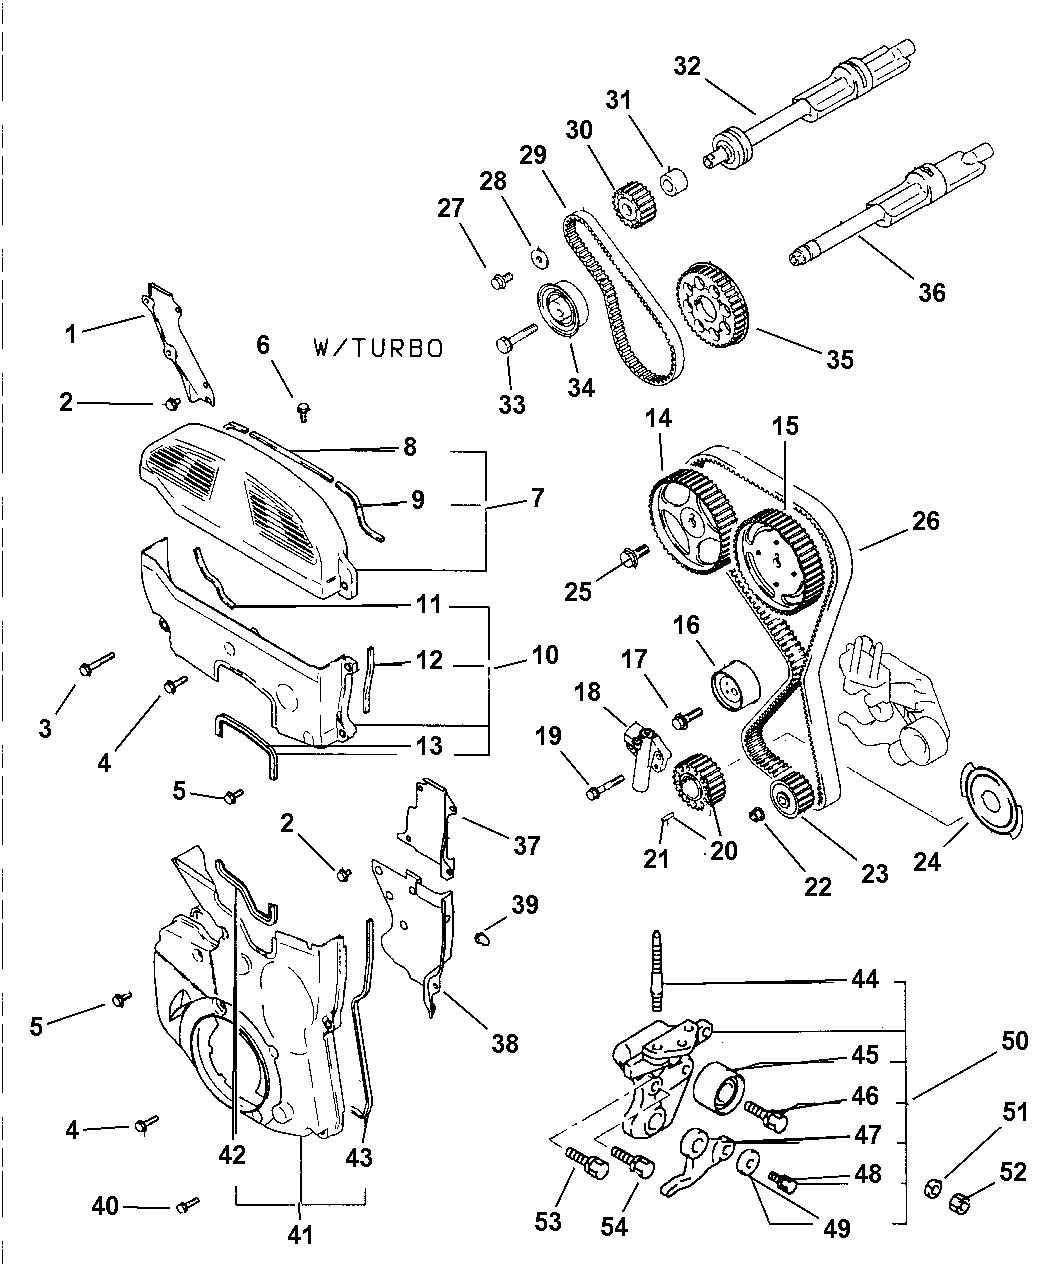 1997 Dodge Avenger Timing Belt, Cover And Balance Shafts - Thumbnail 1